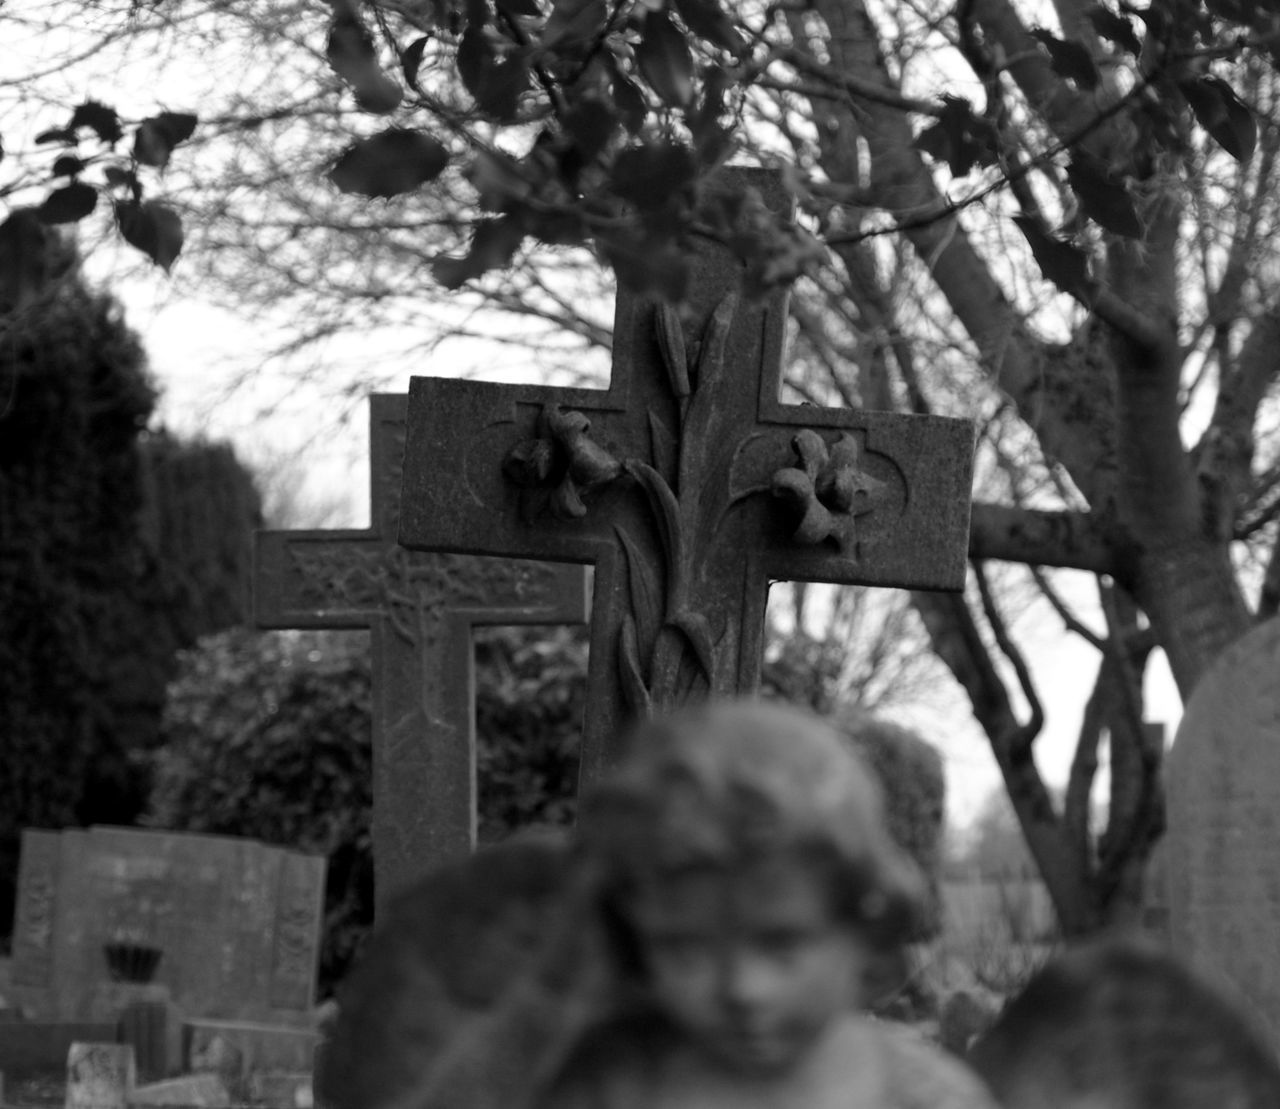 cemetery, tombstone, memorial, graveyard, sadness, tree, cross, gravestone, day, grave, outdoors, spirituality, no people, close-up